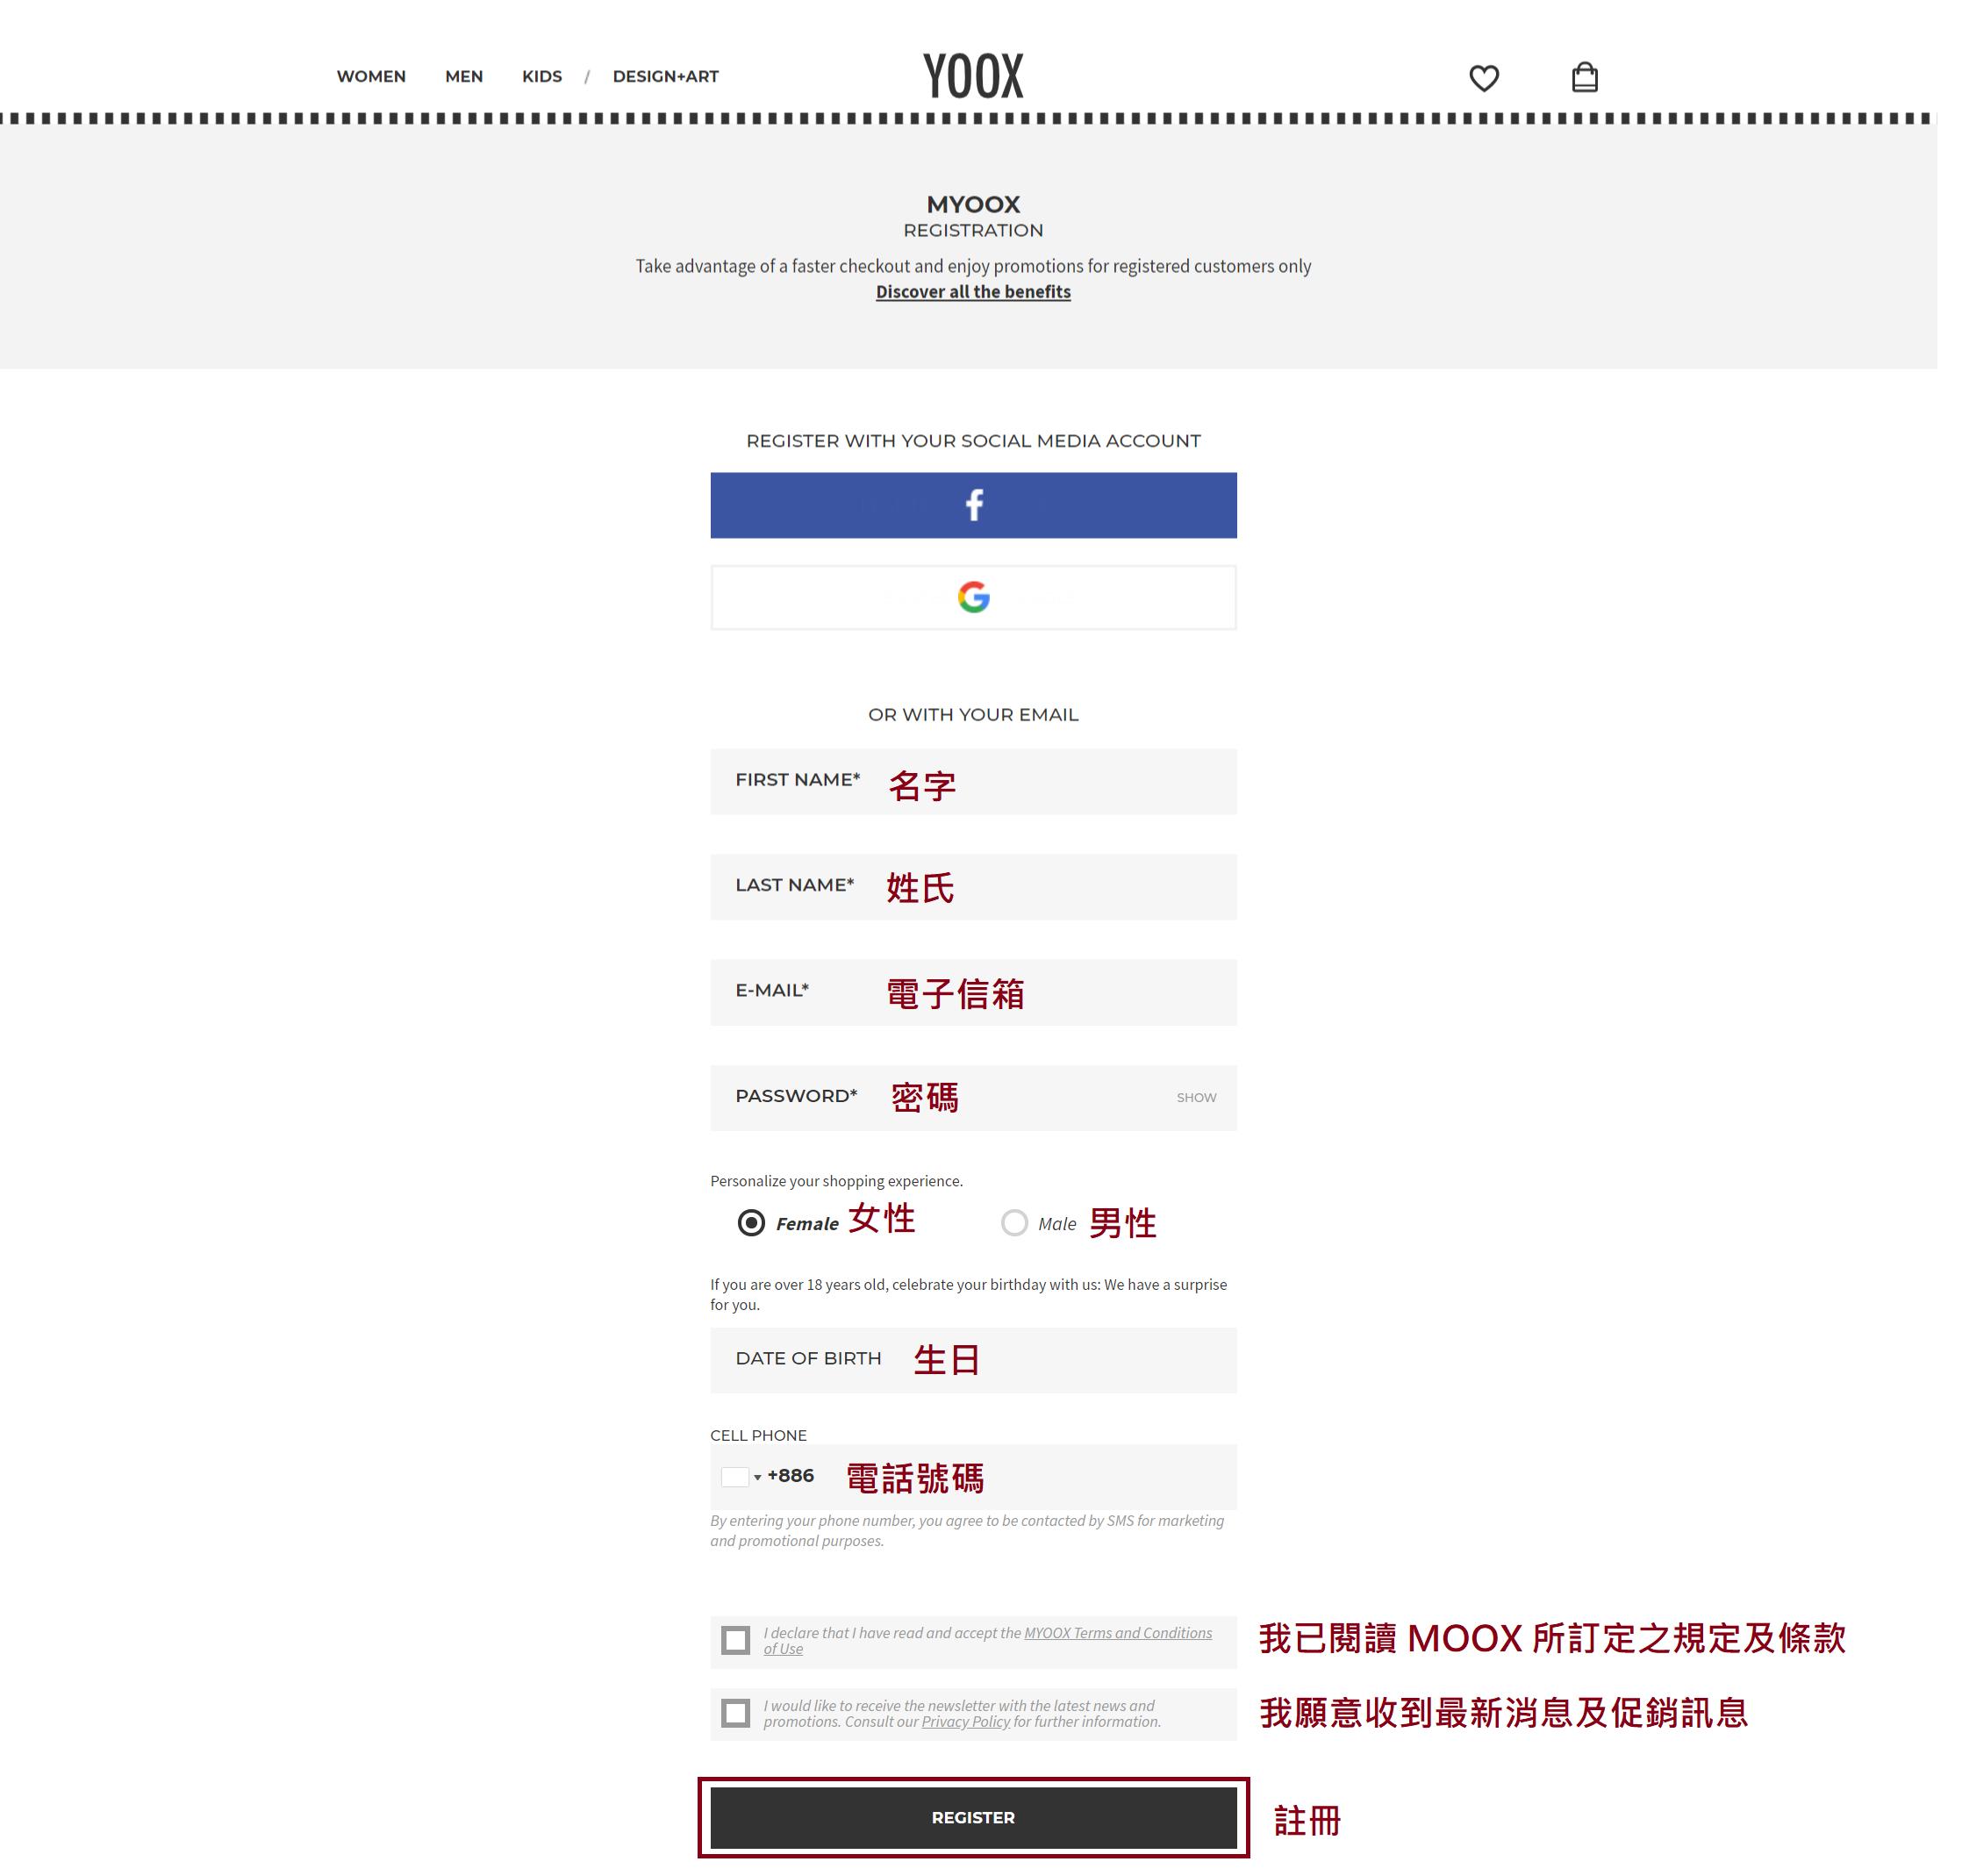 YOOX 購買教學-註冊帳號